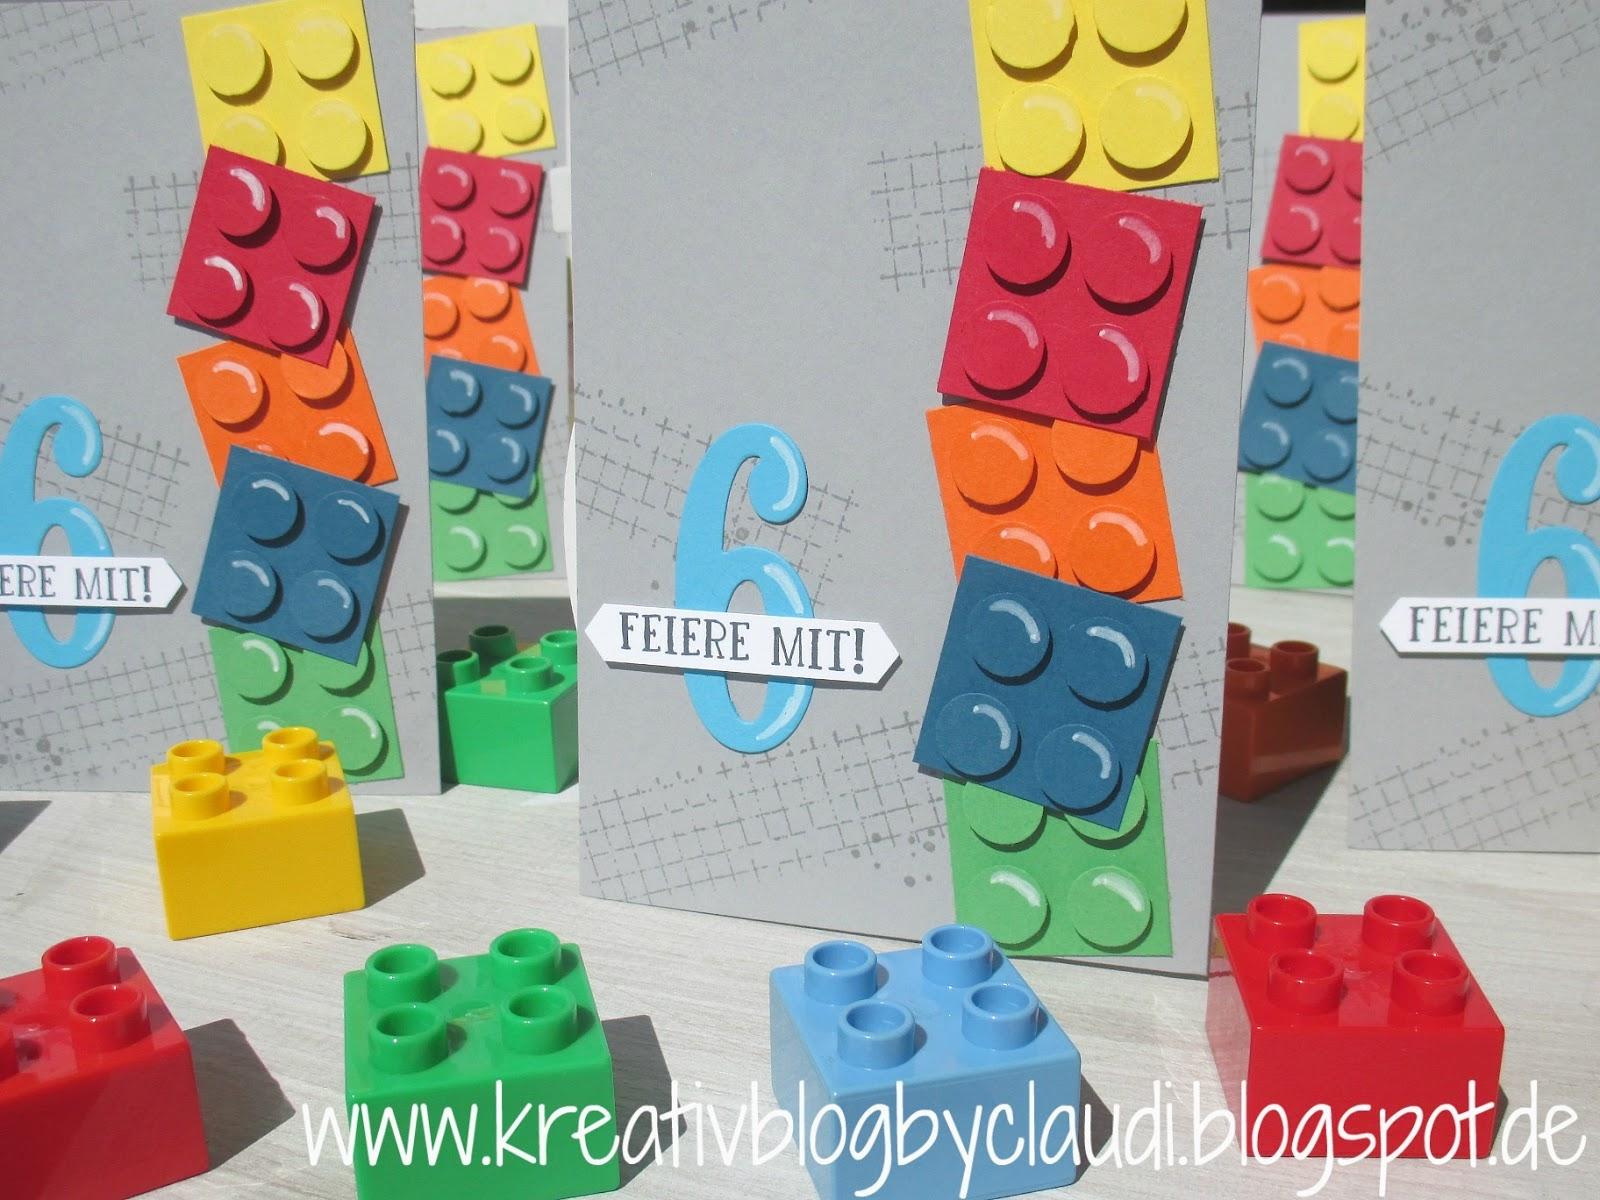 Ninjago Einladung Basteln: Kreativ Blog By Claudi: Lego-Einladungen